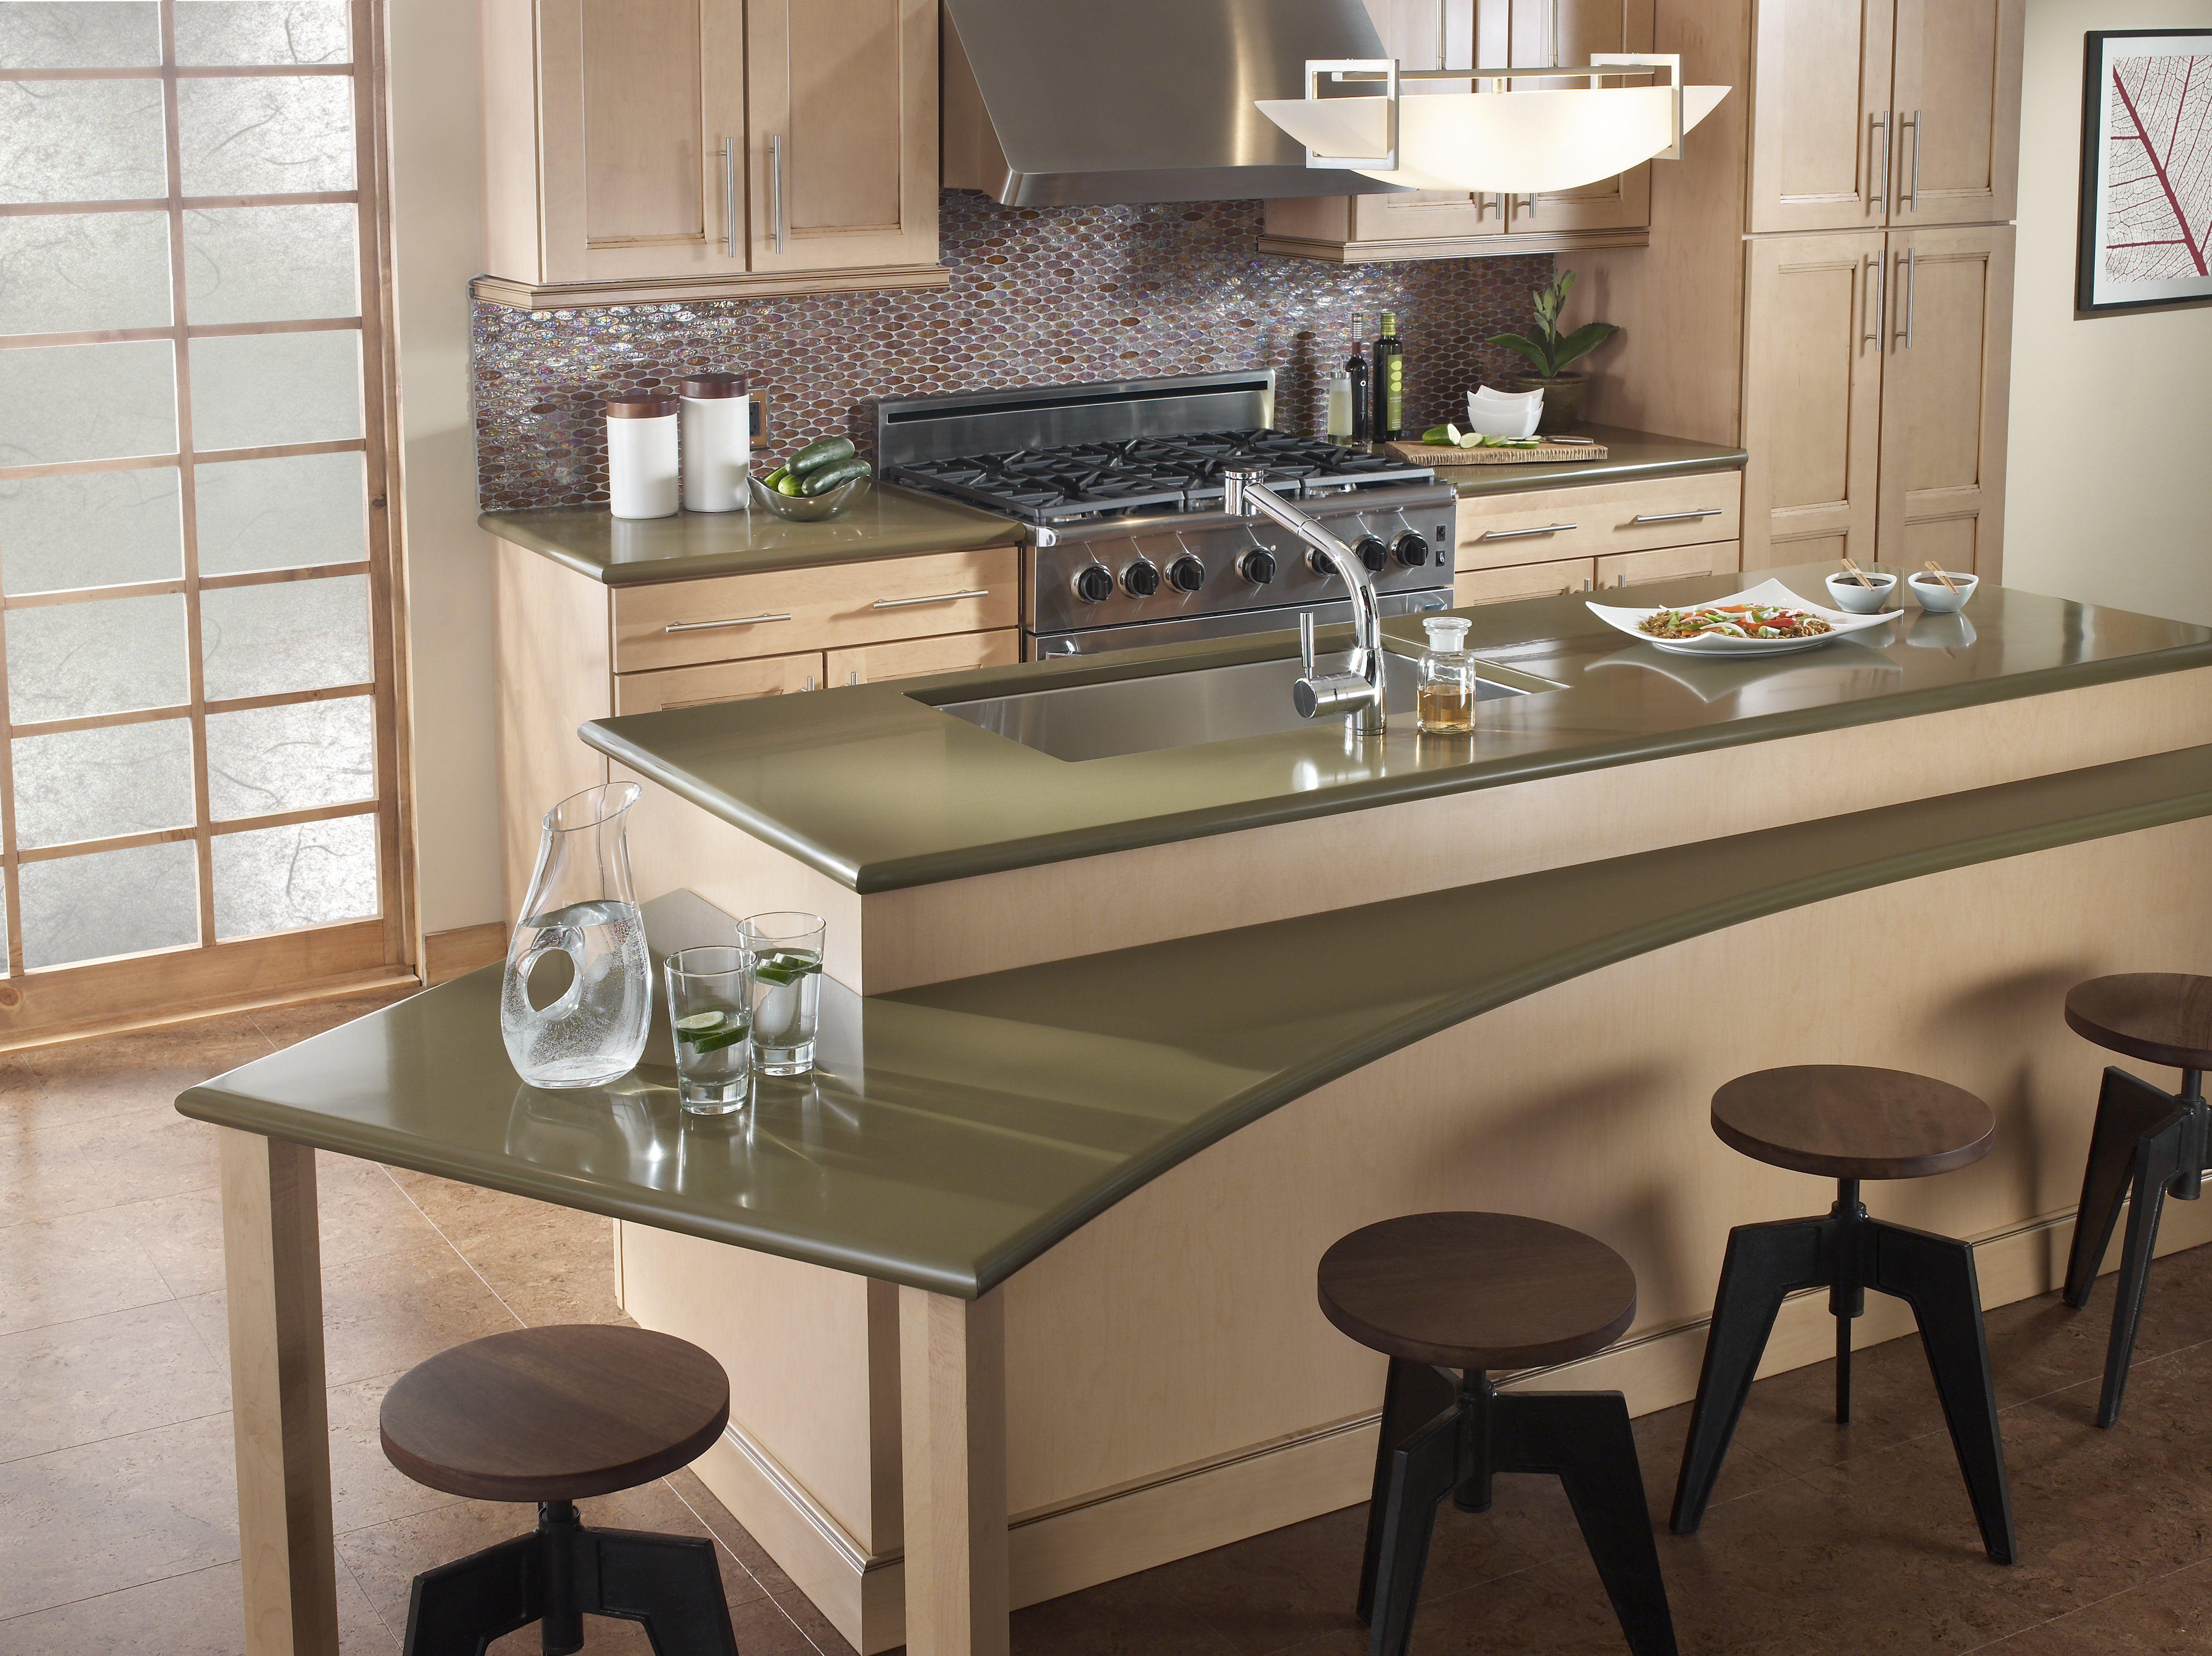 cambria corian by brittanicca kitchen dasfoodsc a countertop granite vs countertops marvelous new of quartz pictures with photograph white